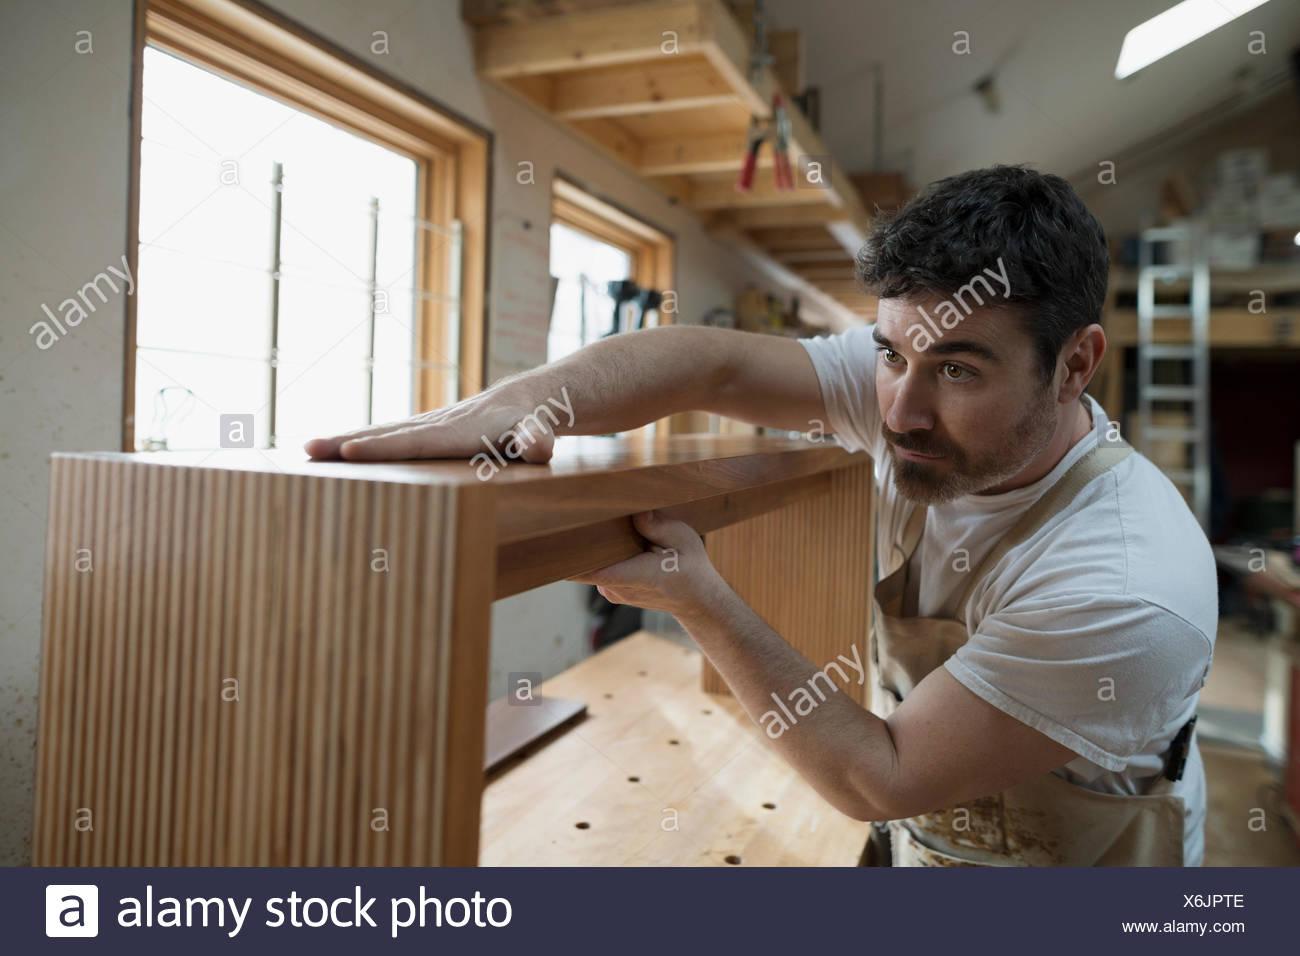 Carpenter assembling furniture in workshop - Stock Image